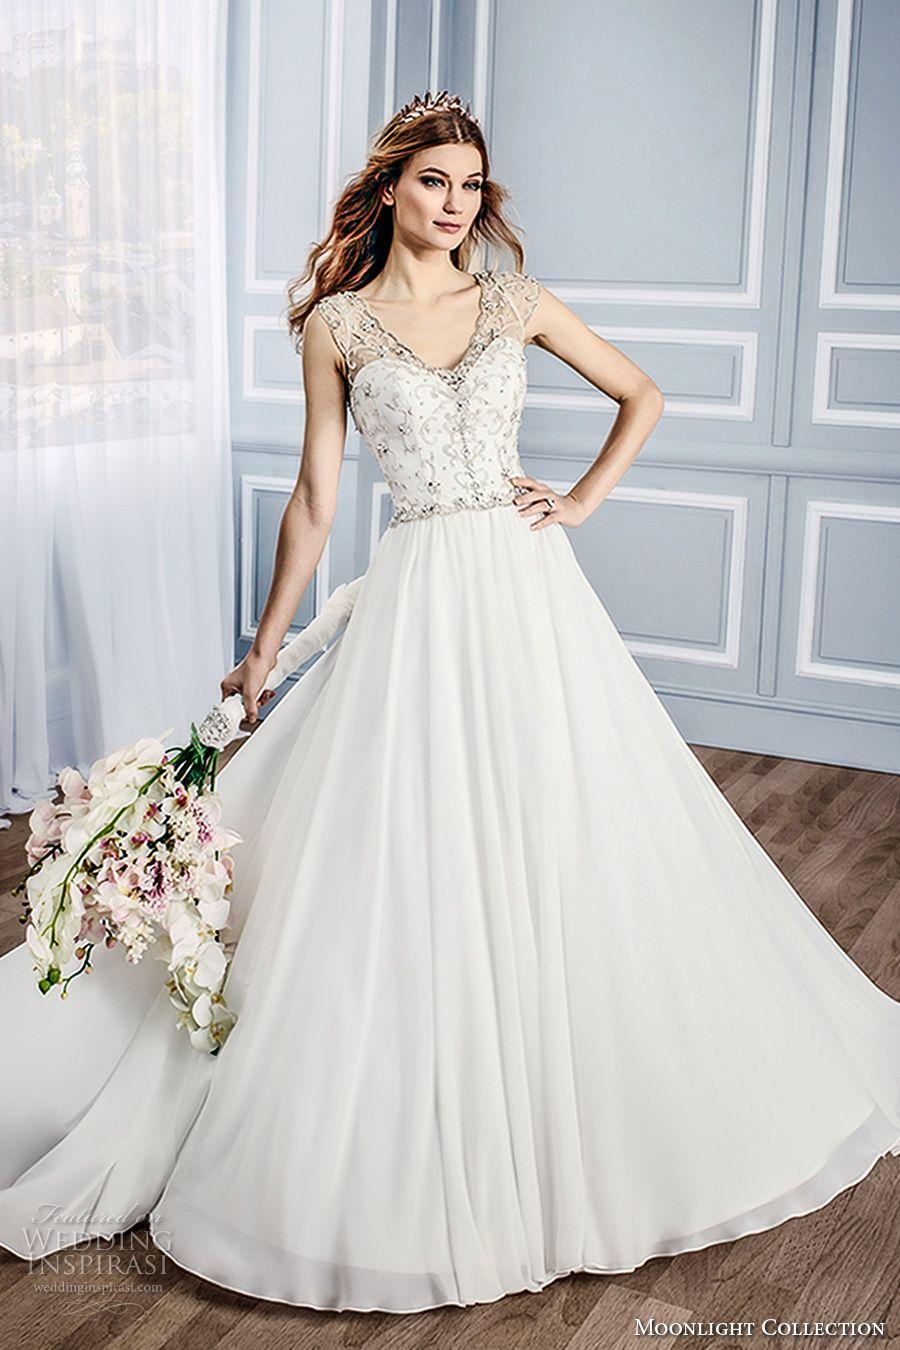 Moonlight collection fall wedding dresses chapel train